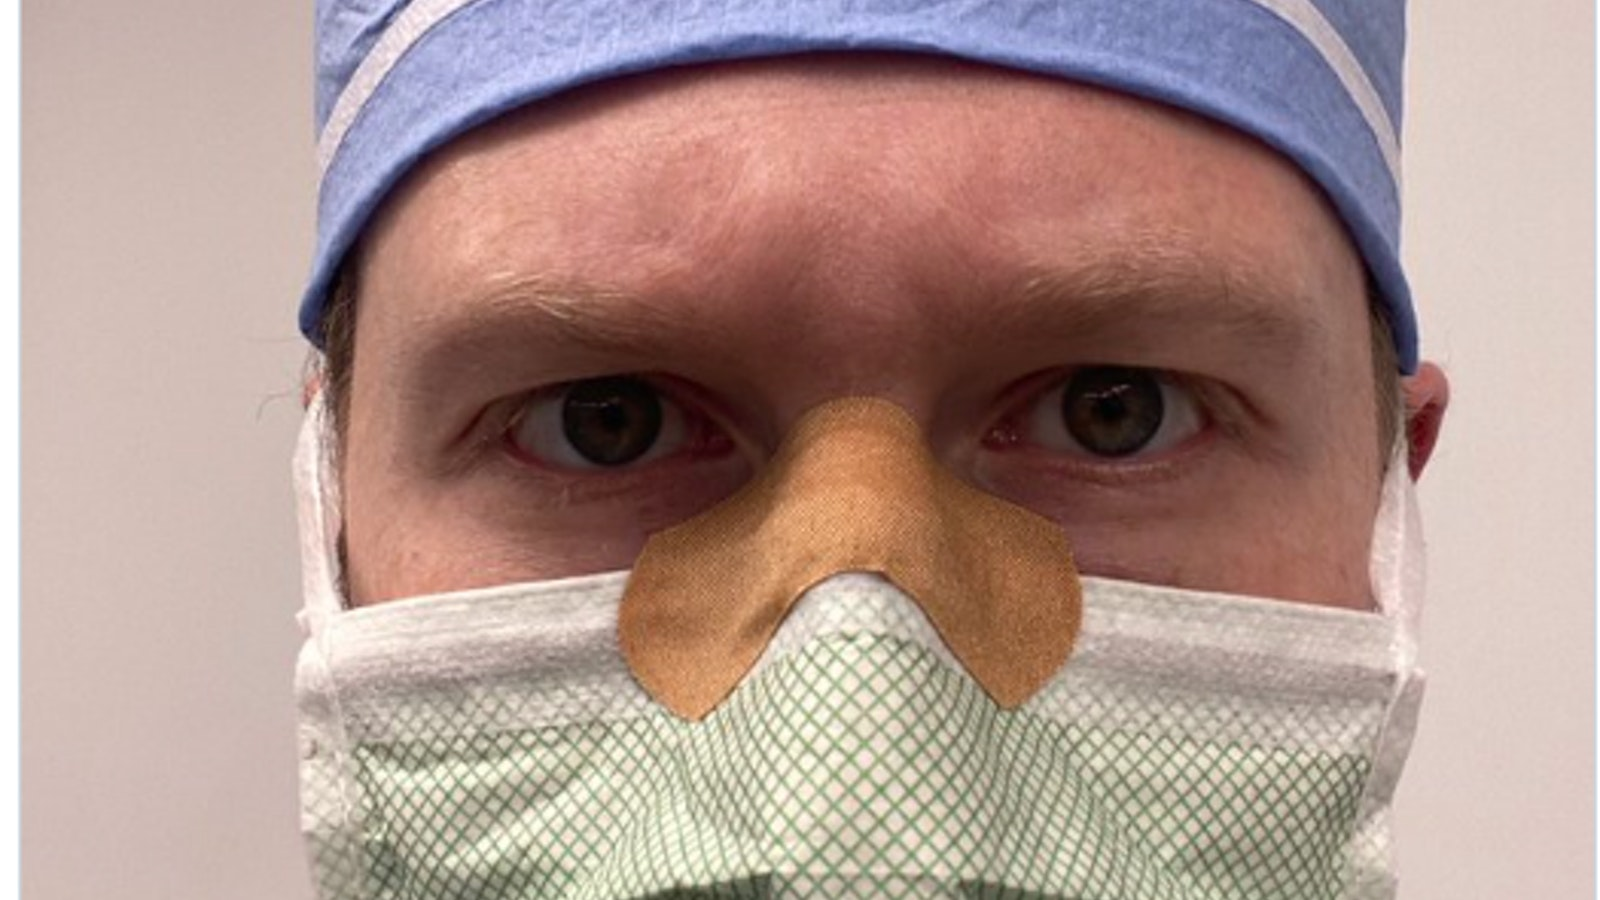 Daniel Heiferman Band Aid Mask